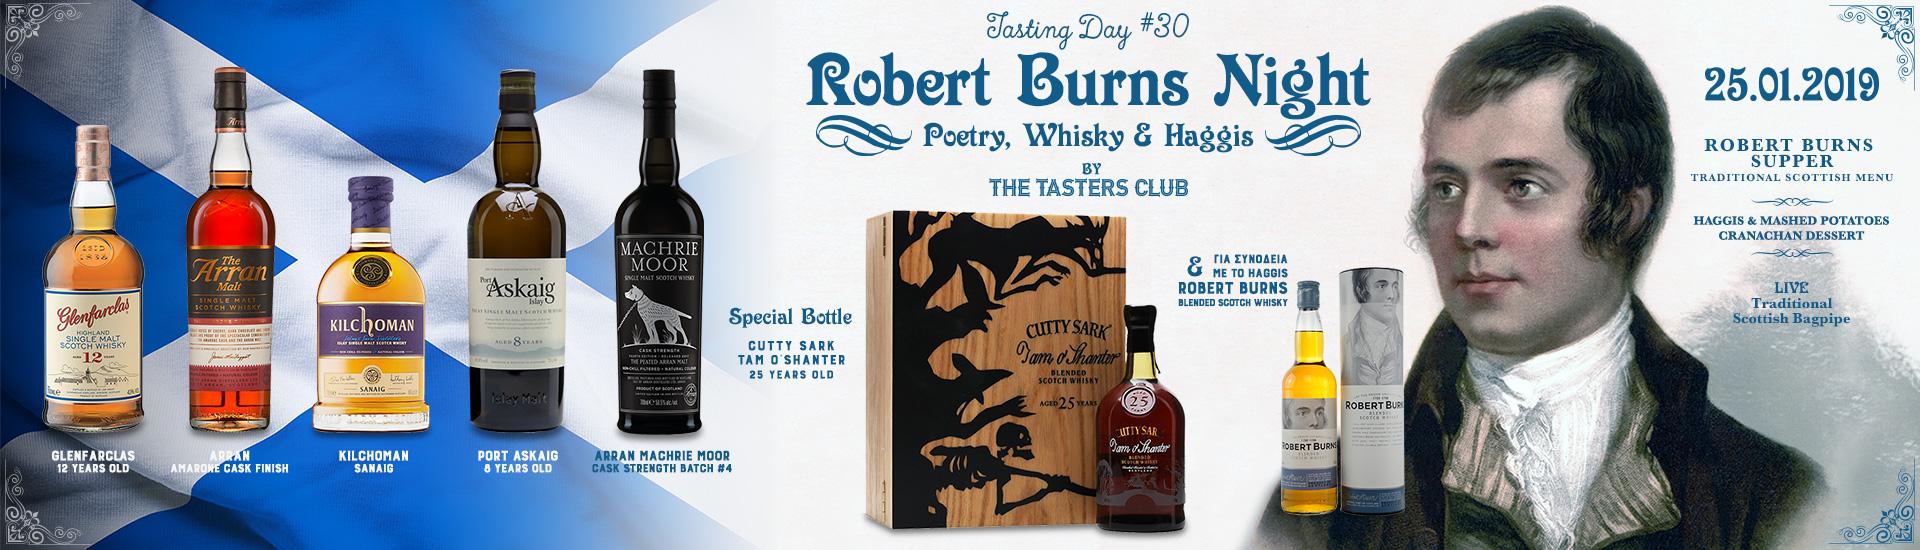 robert burns night the tasters club